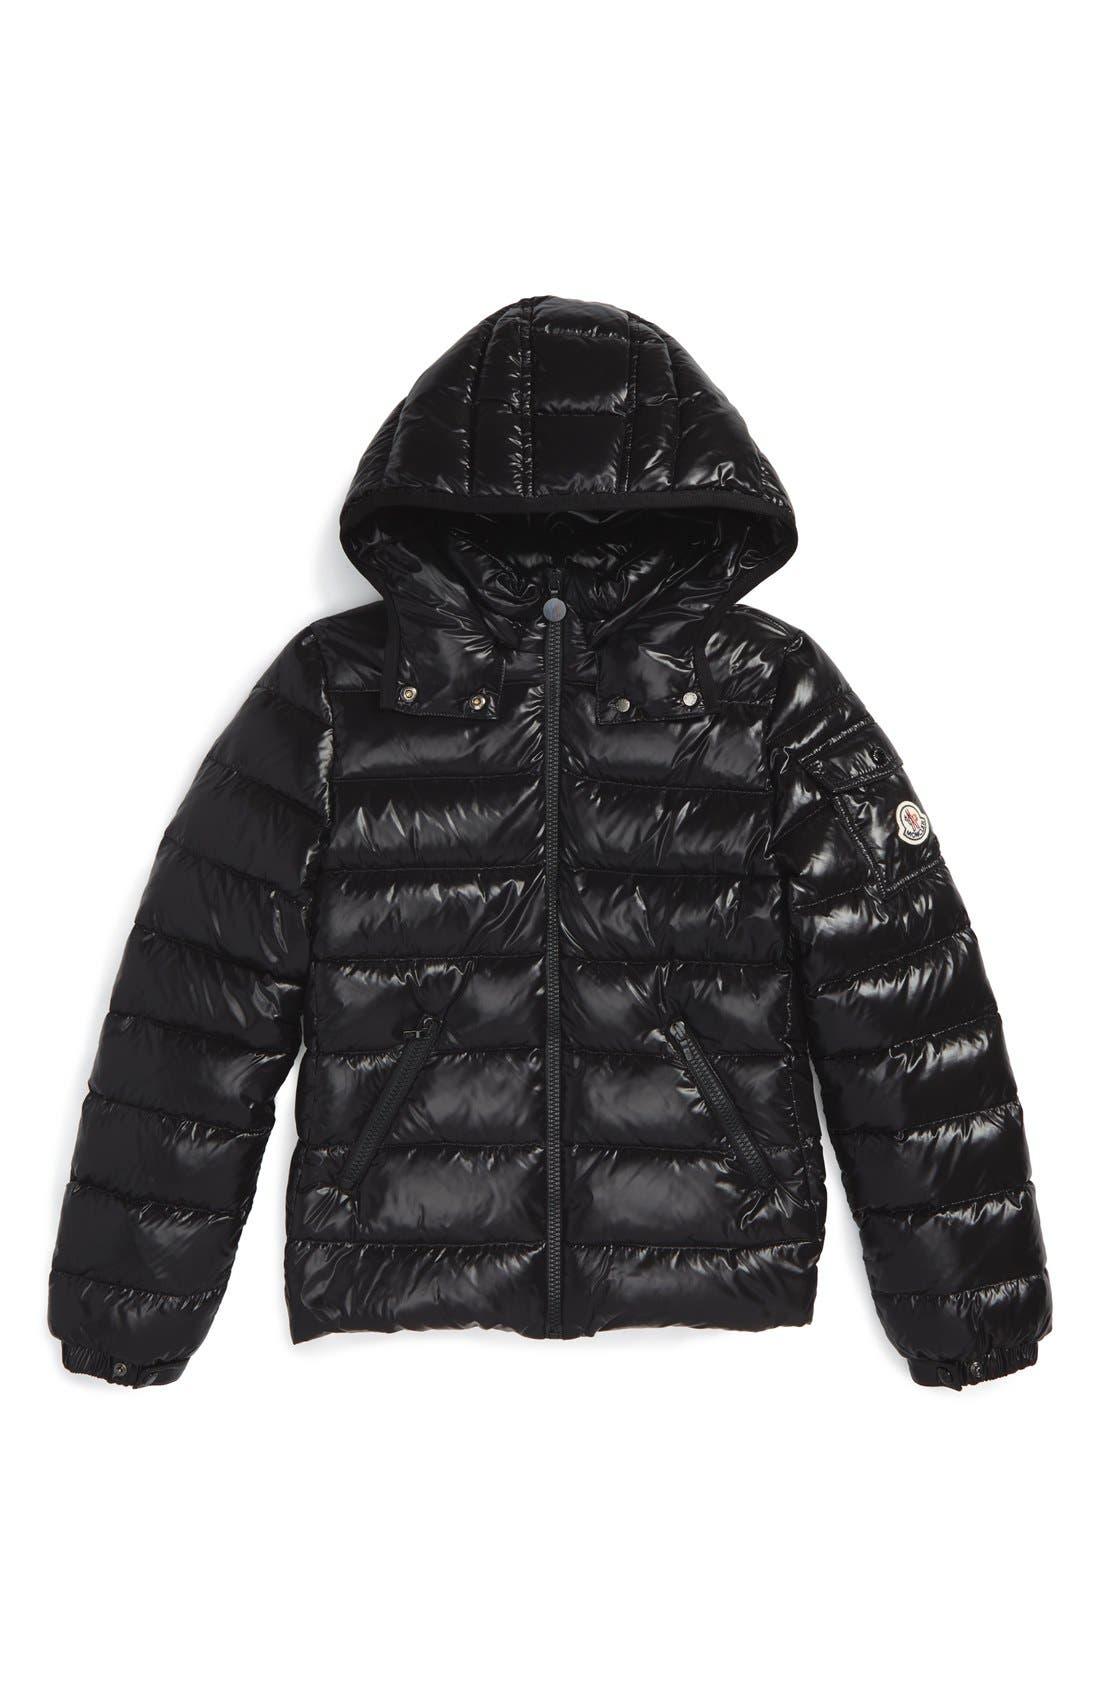 Alternate Image 1 Selected - Moncler 'Bady' Hooded Down Jacket (Toddler Girls, Little Girls & Big Girls)